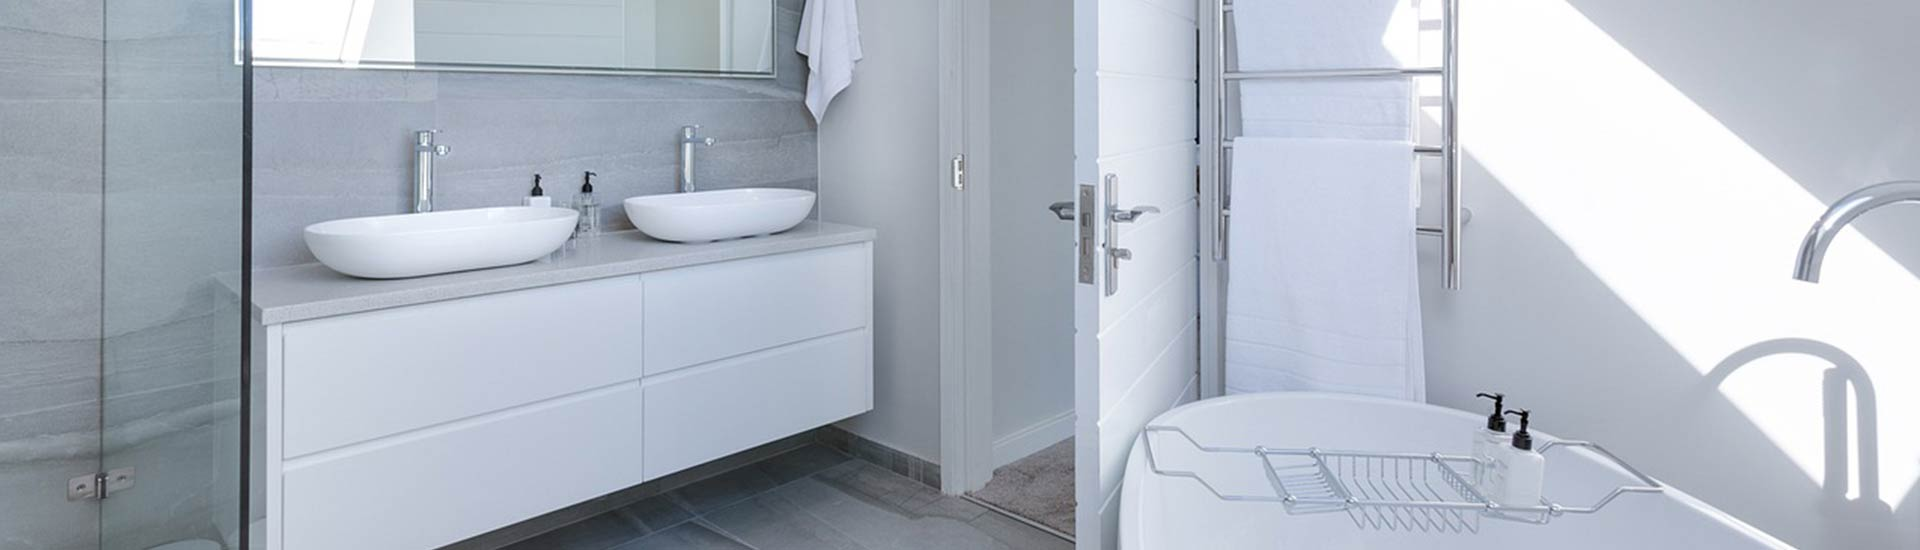 Bathroom Remodeling in Sugar Land, Katy, TX, Houston